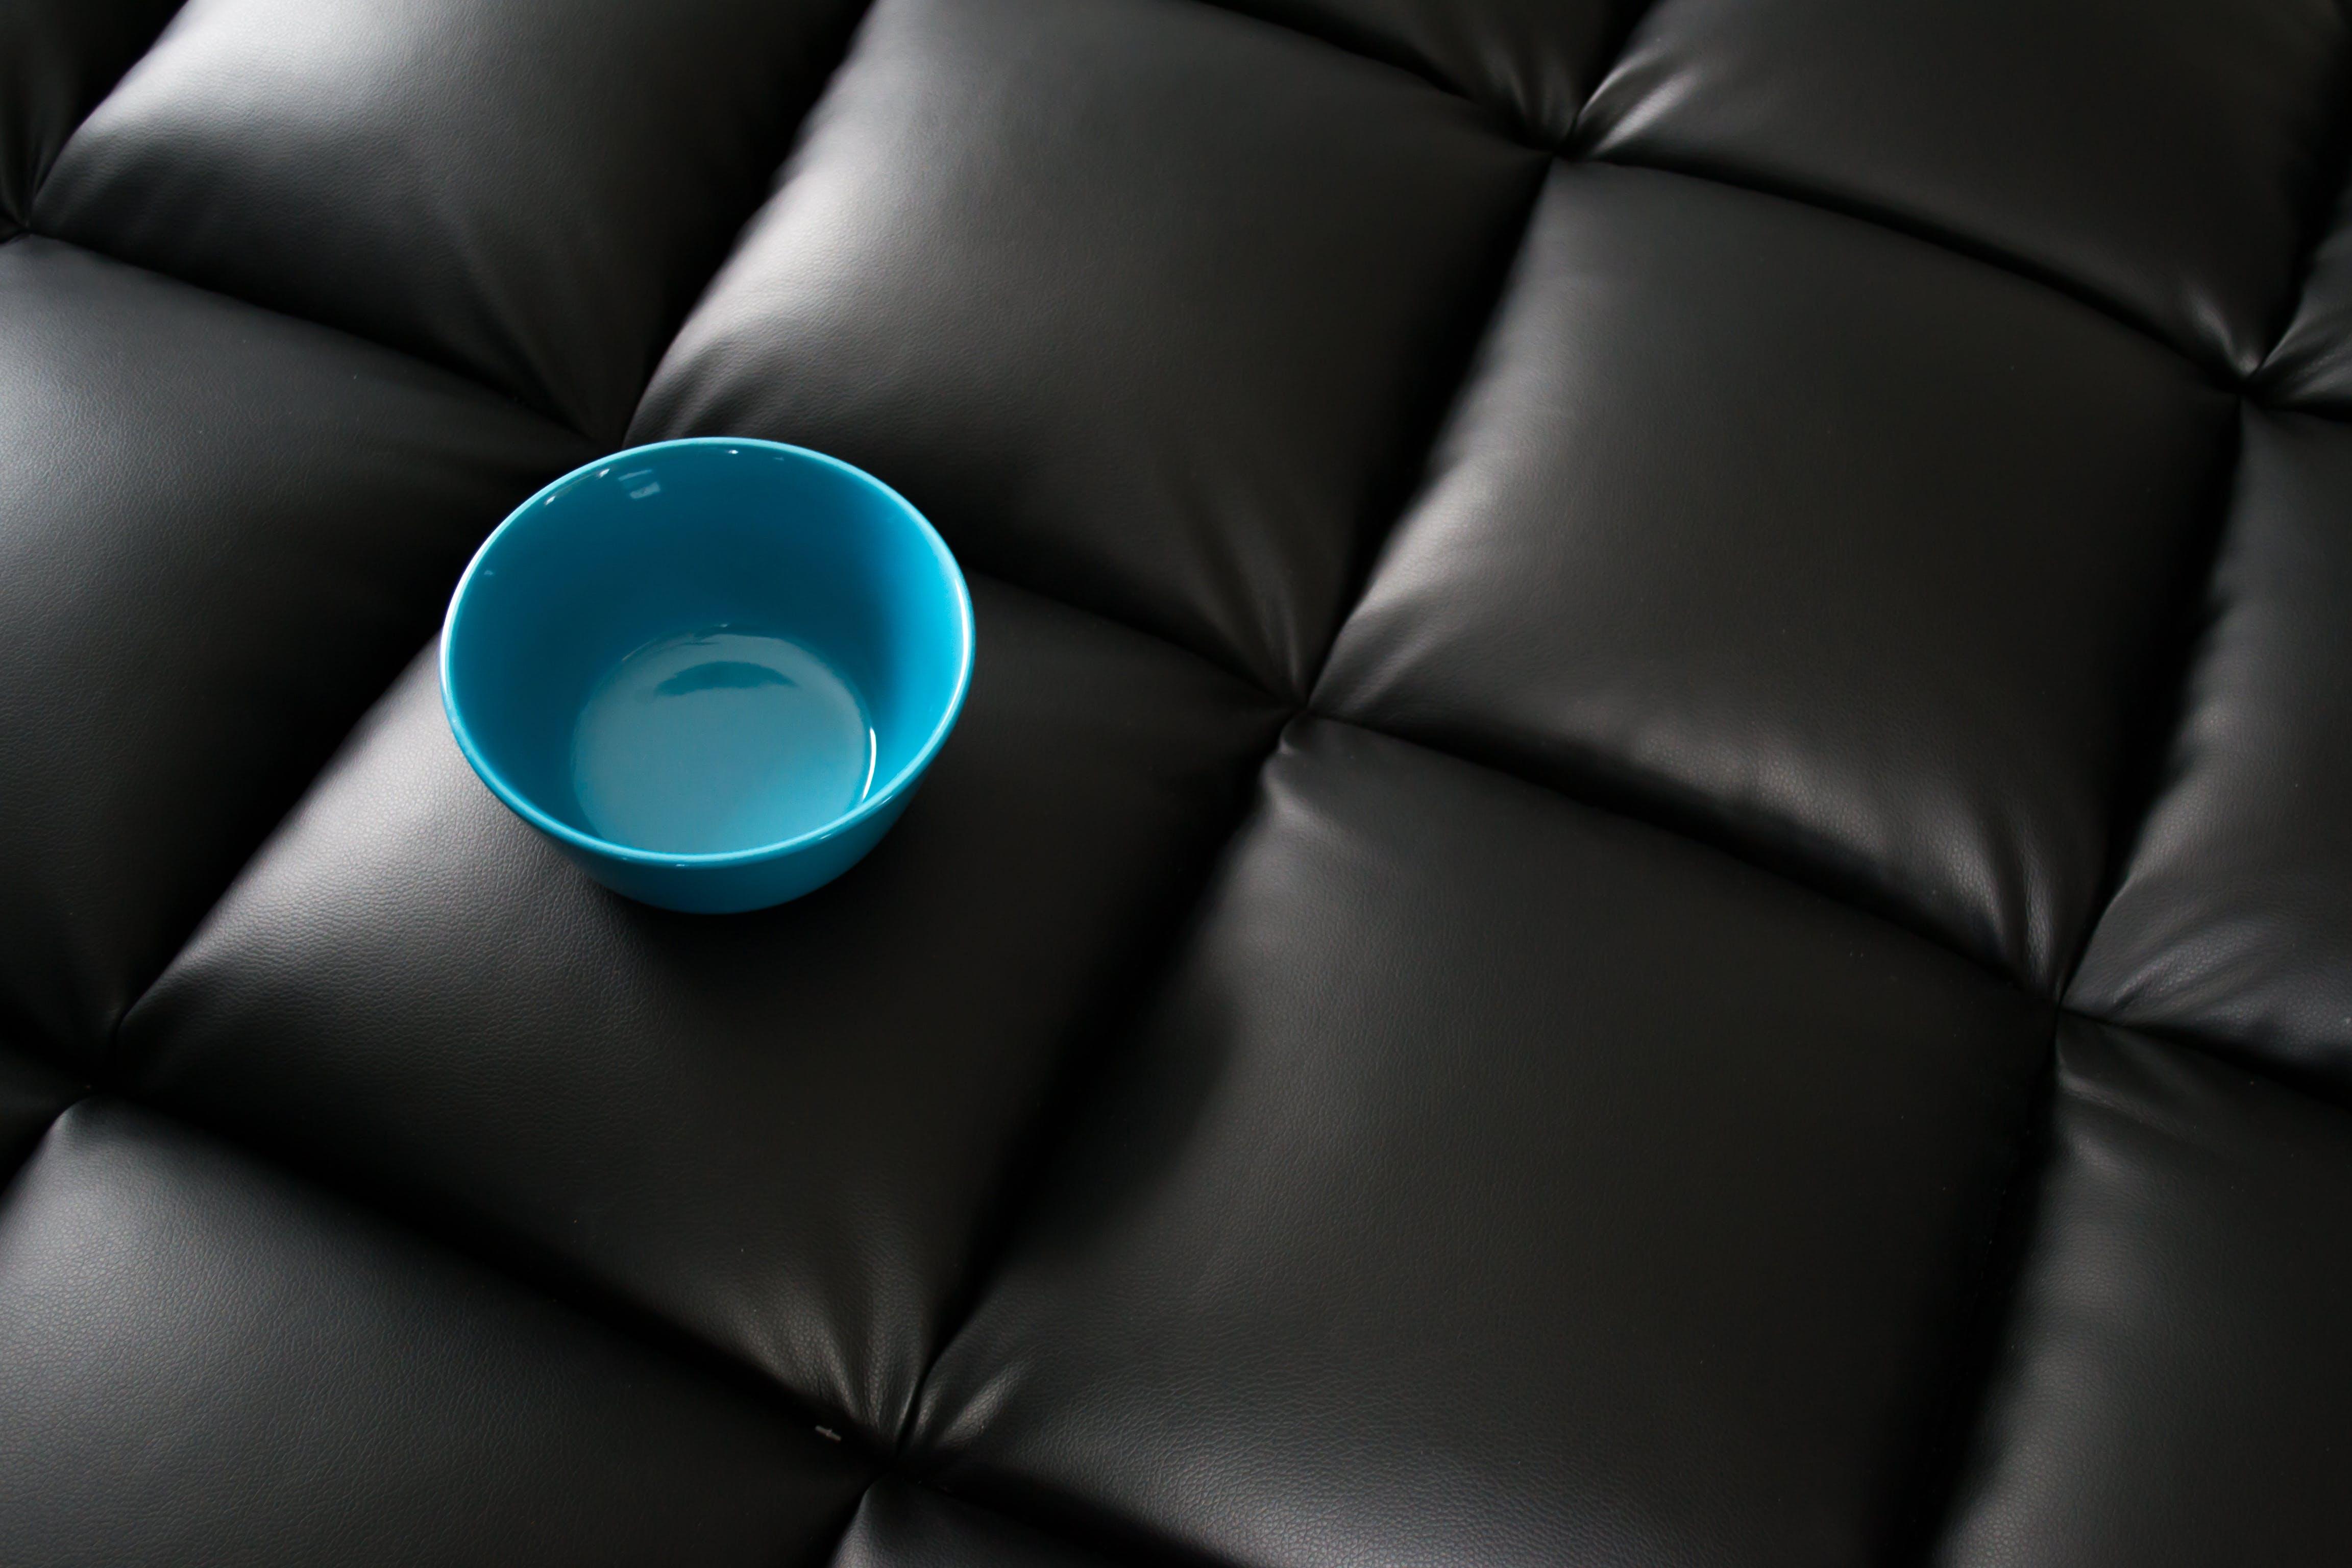 Blue Ceramic Bowl on Black Leather Surface